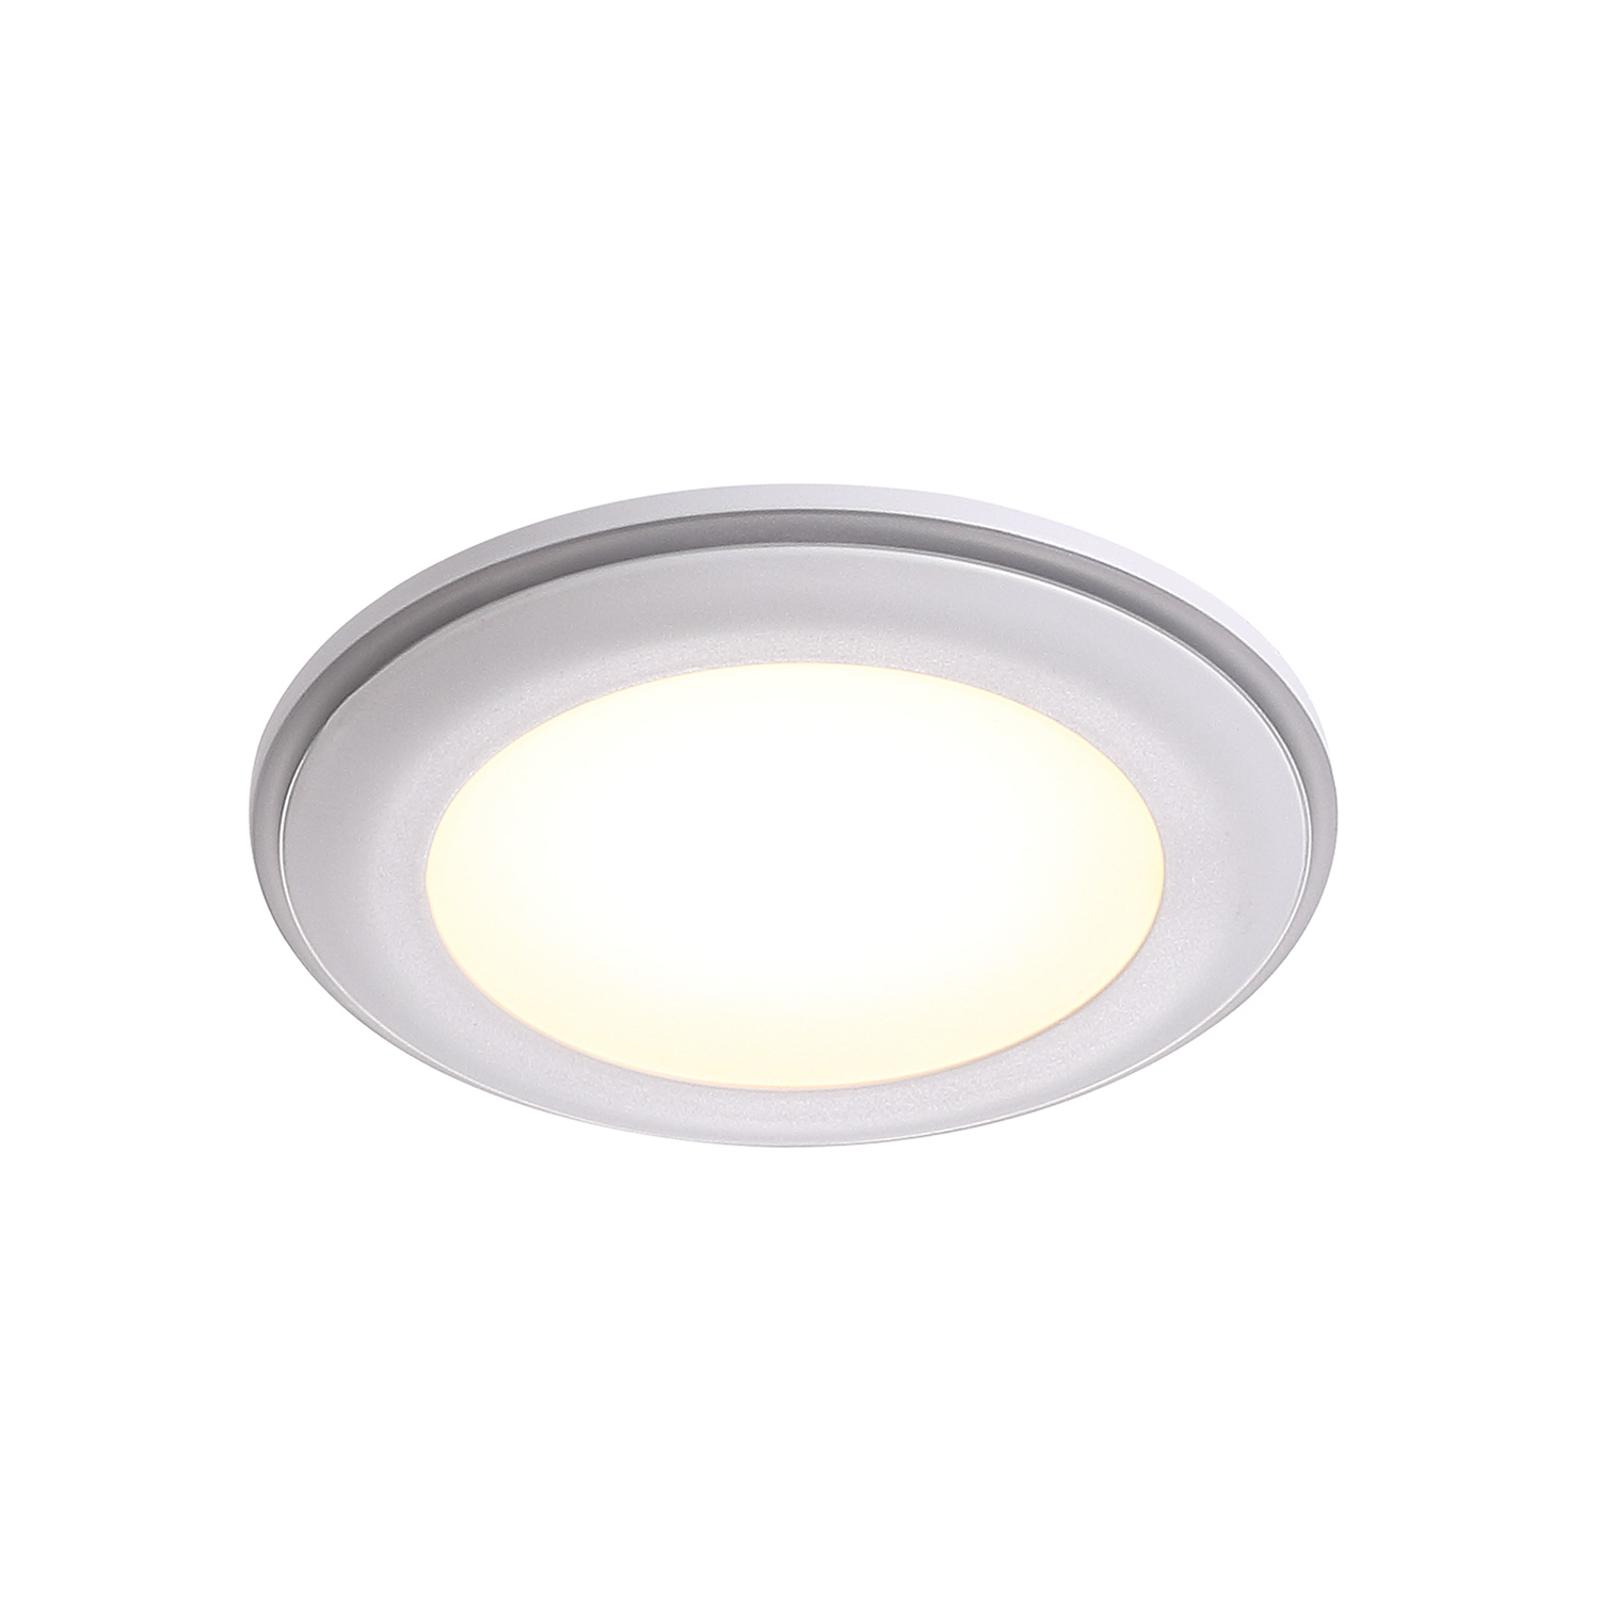 Lampa sufitowa wpuszczana LED Elkton, Ø 8 cm